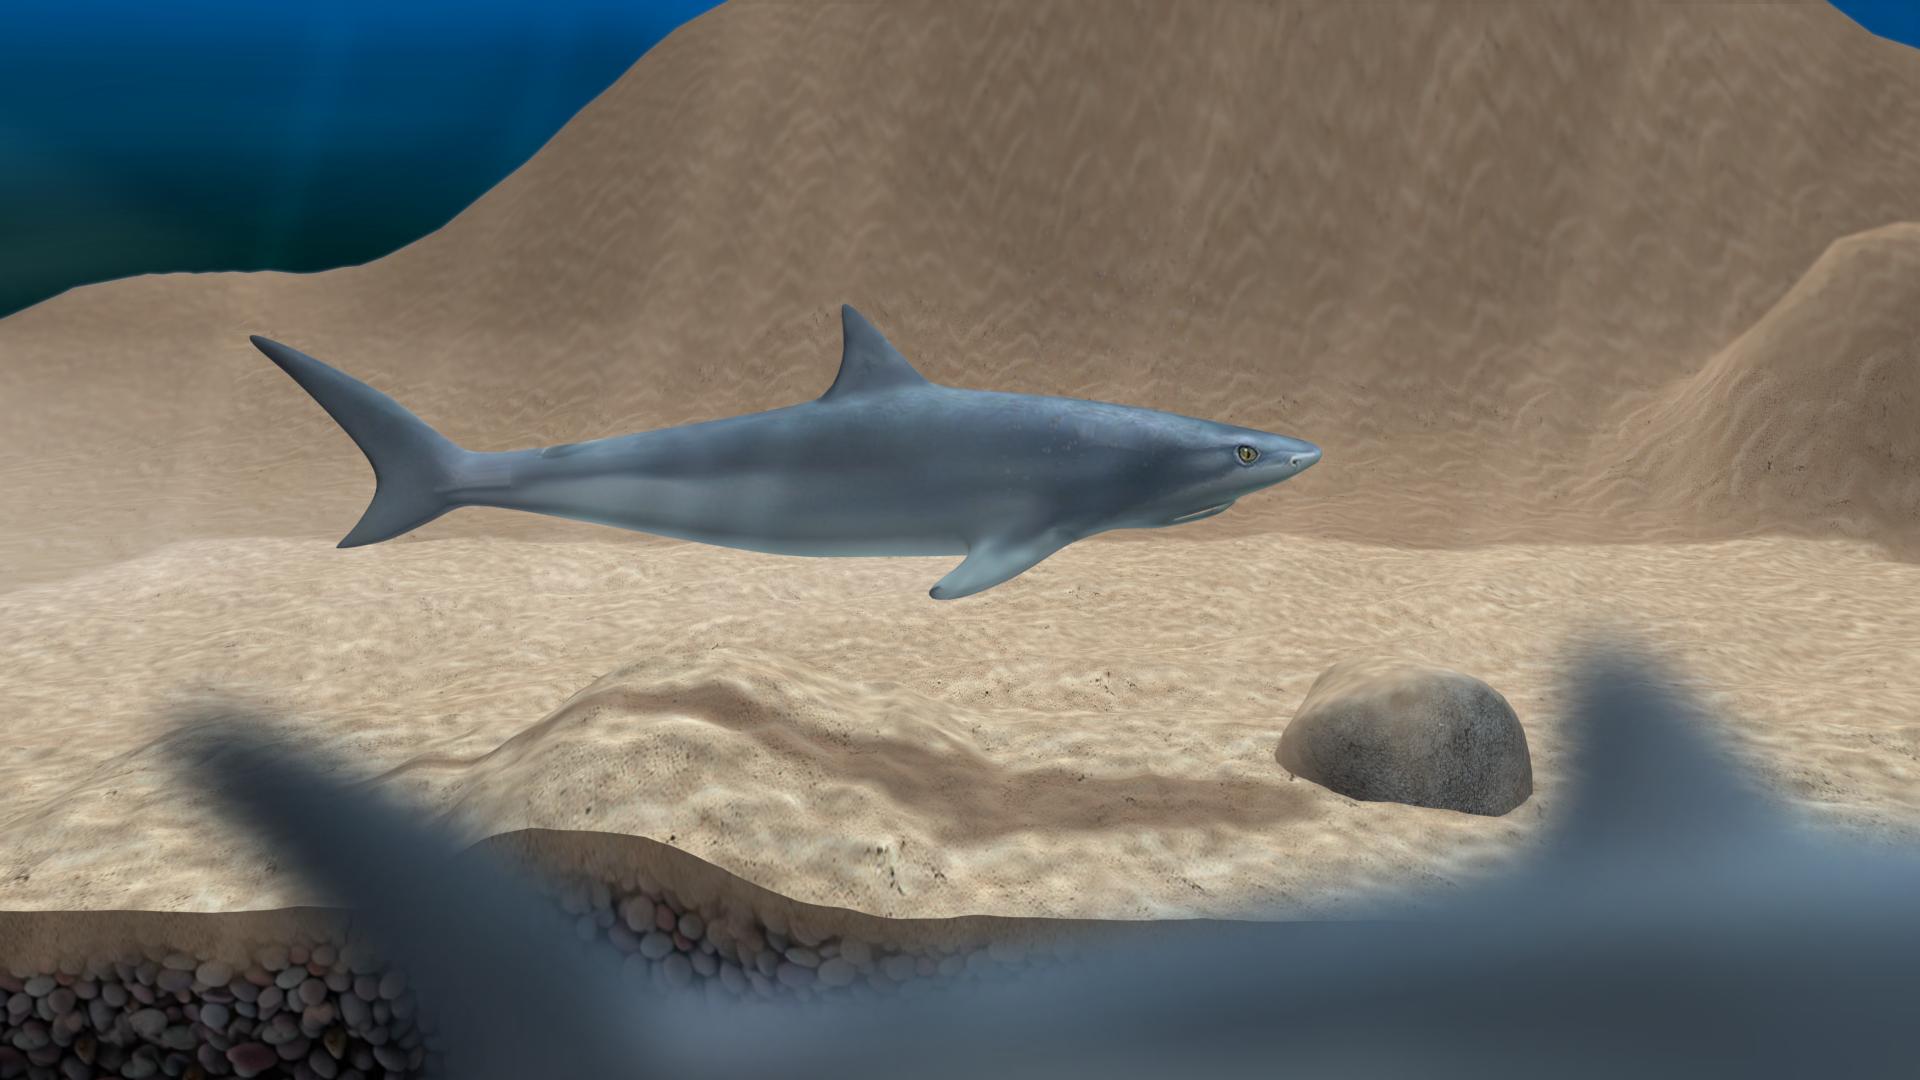 Shark game concept